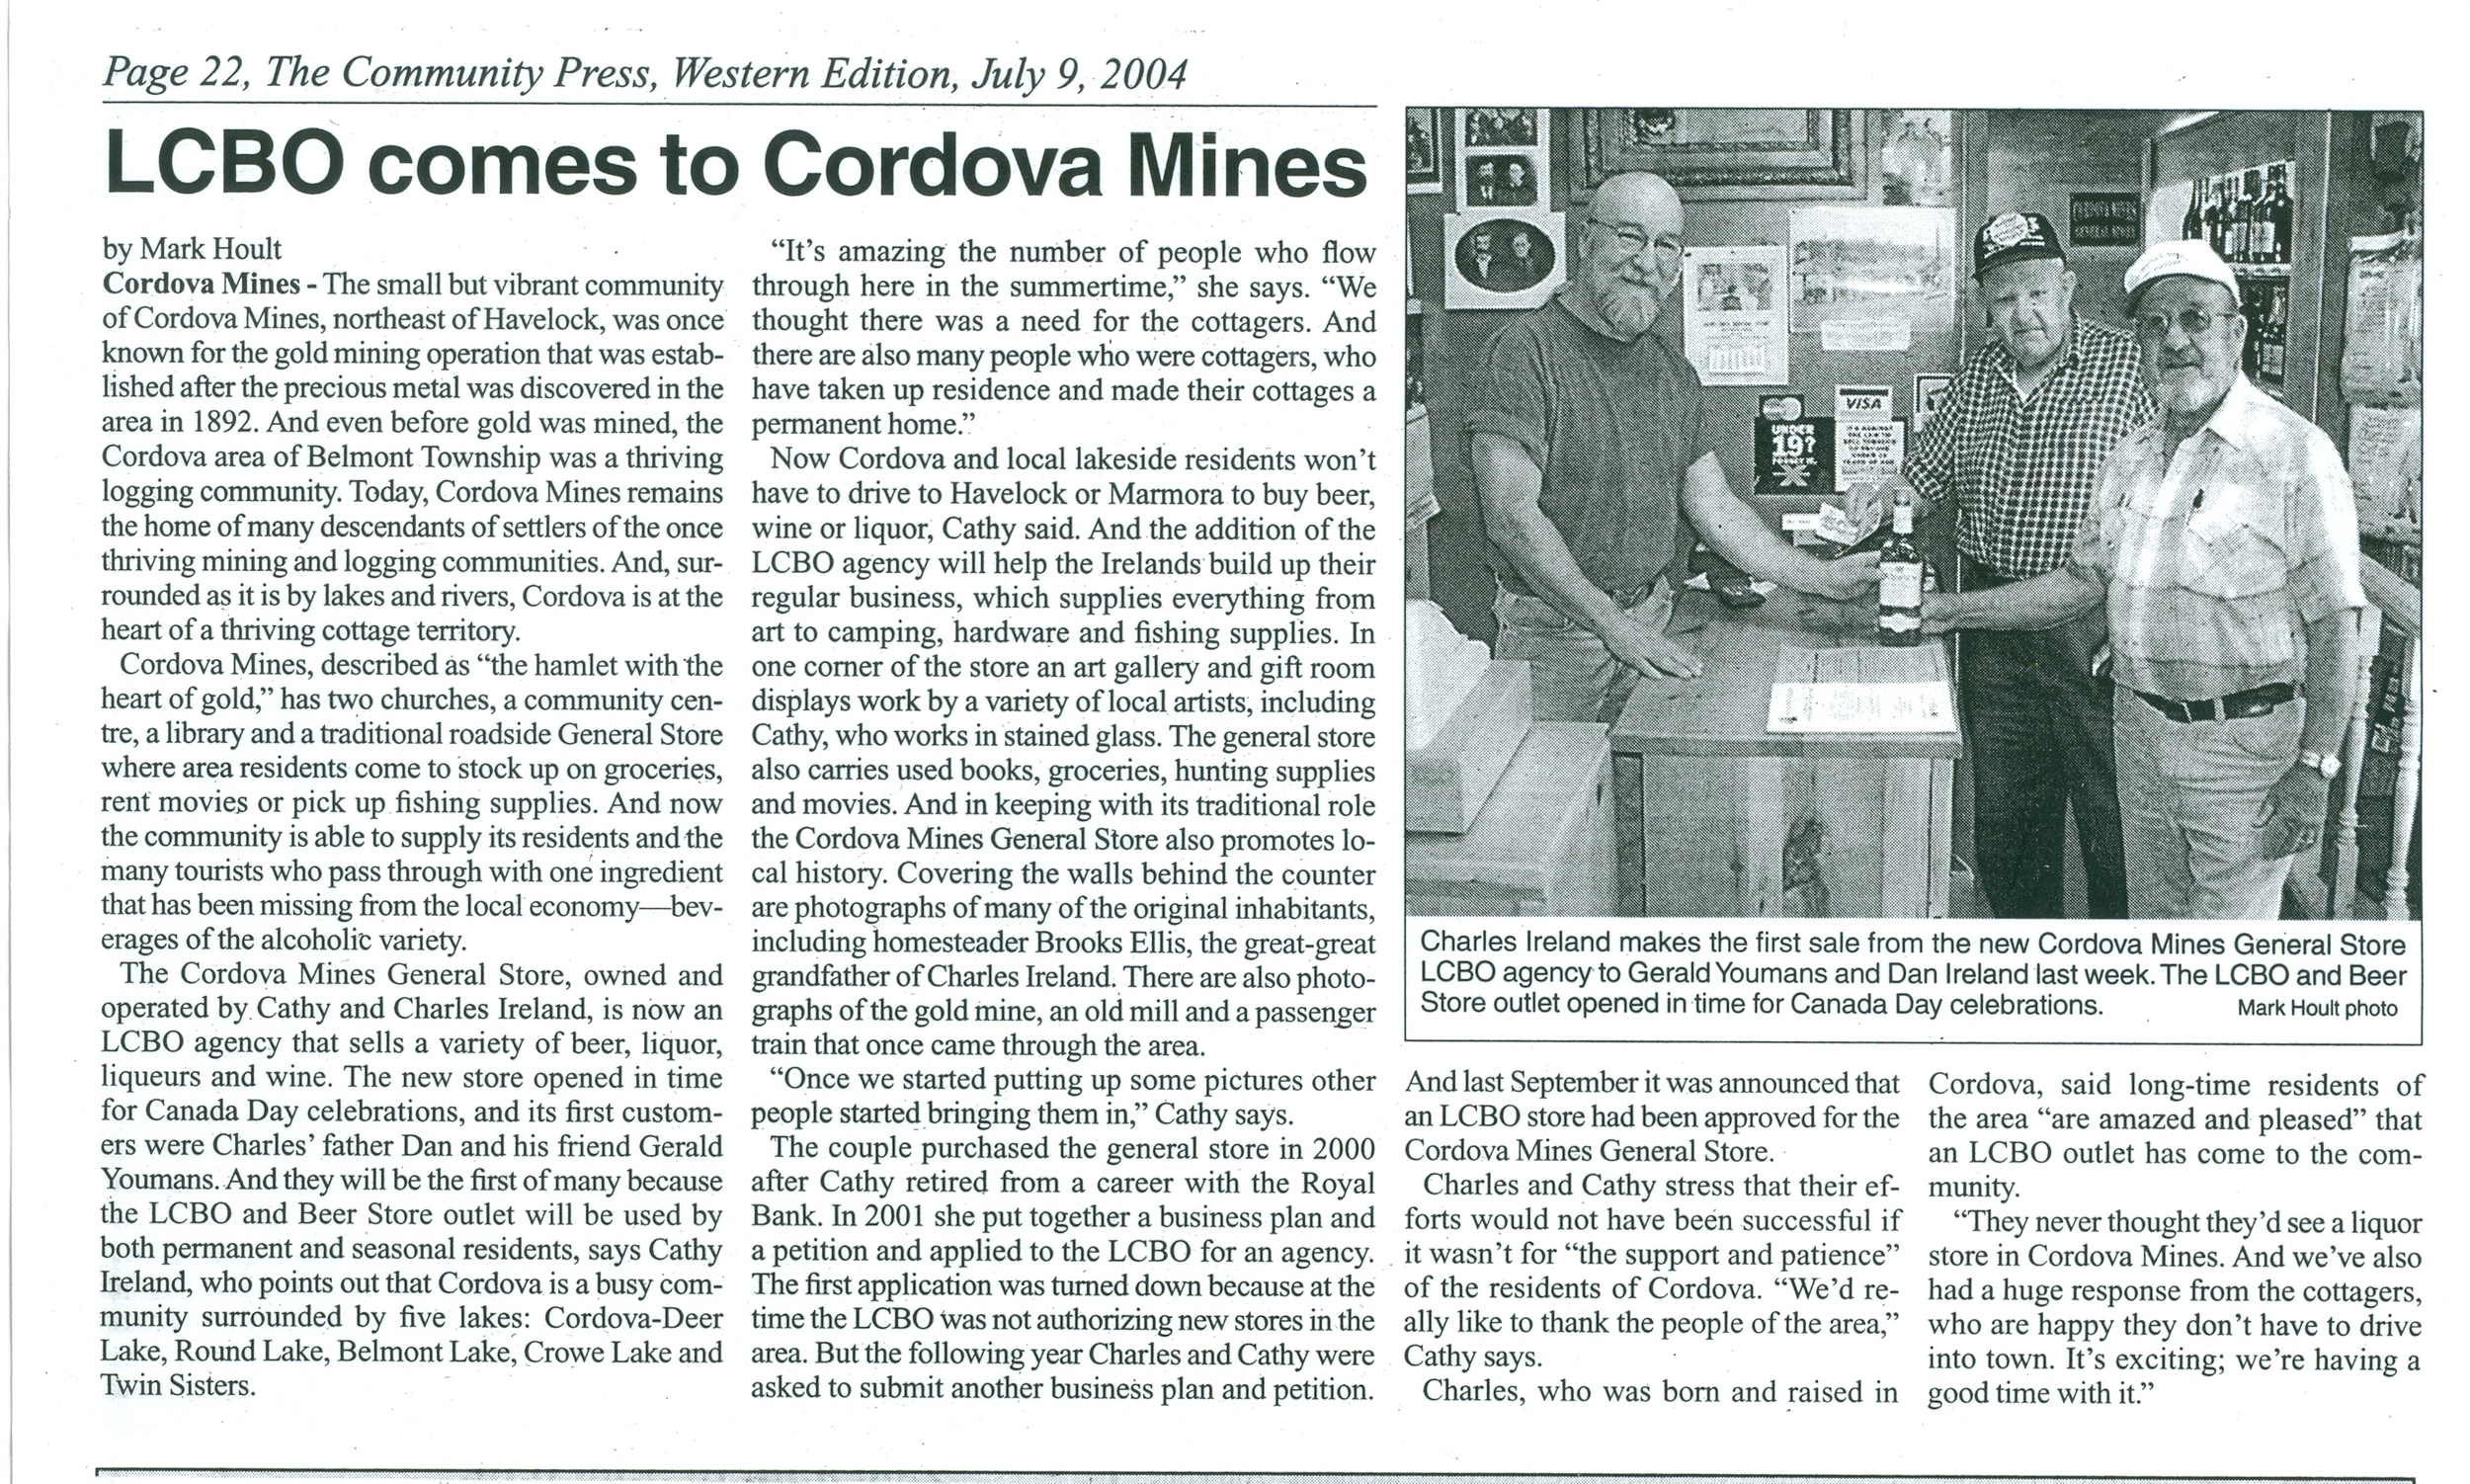 Cordova General Store LCBO 2004 Charles Ireland.jpg